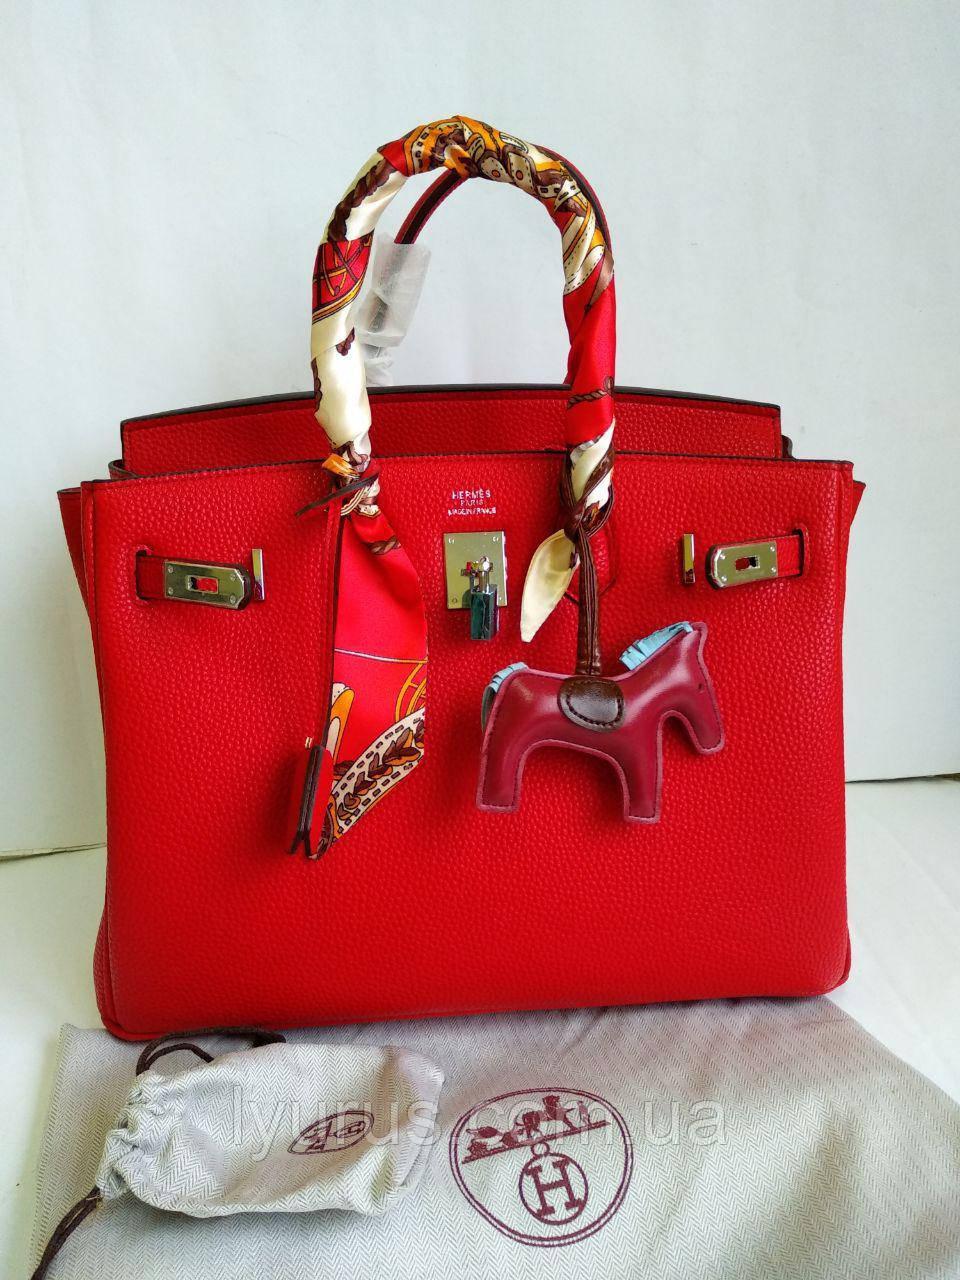 55284223a422 Женская сумка в стиле Hermes Birkin Red 35см: продажа, цена в ...